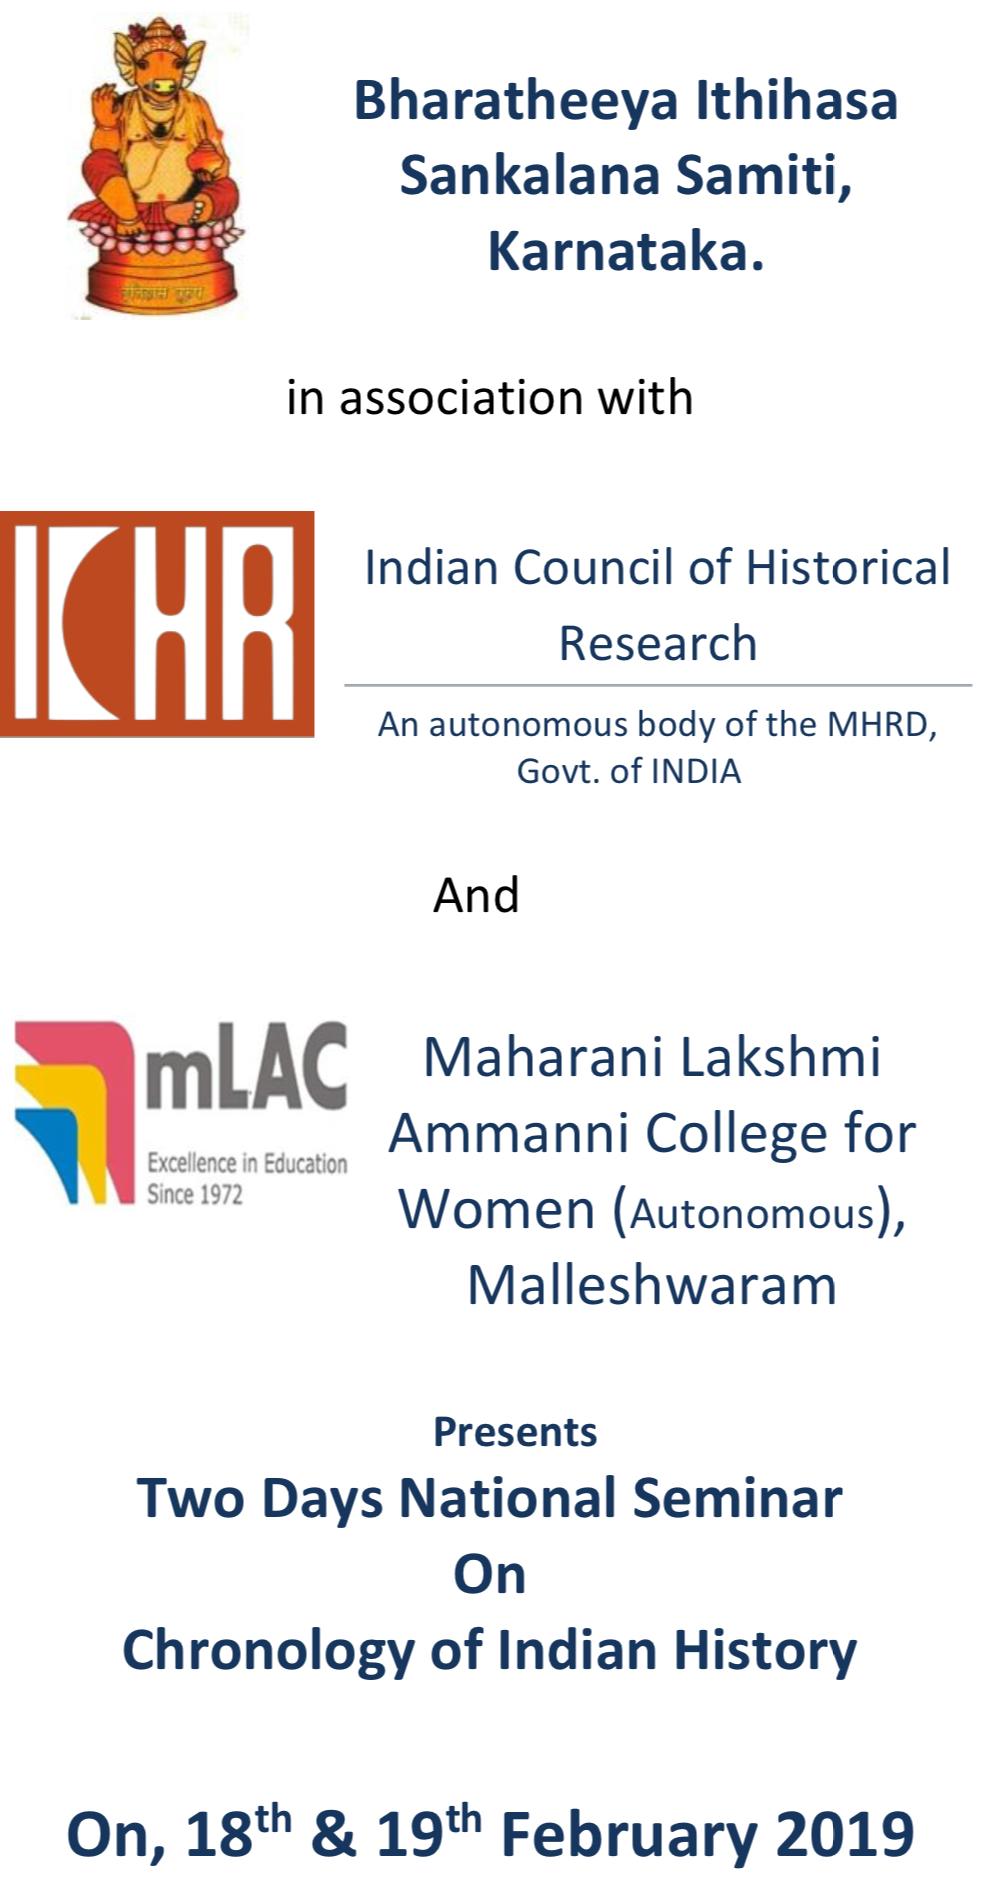 2Day national seminar on chronology of Indian History at Bengaluru